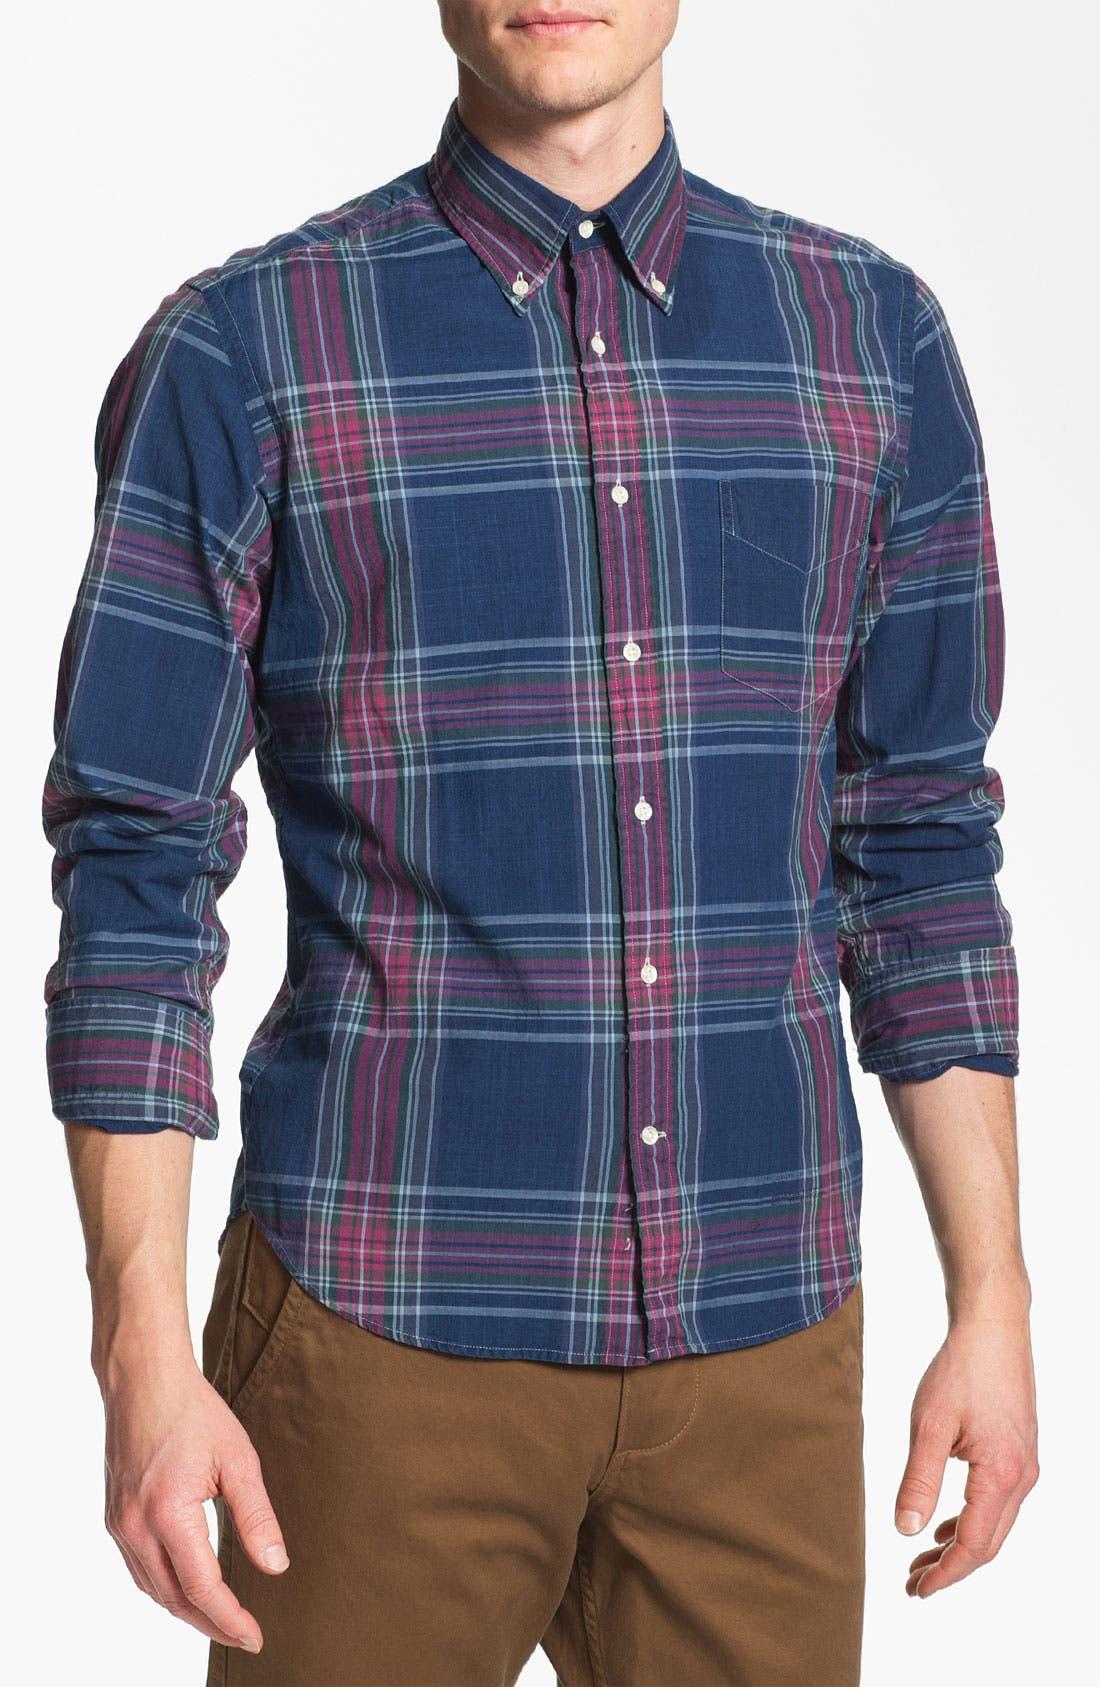 Alternate Image 1 Selected - Gant Rugger Madras Plaid Woven Shirt